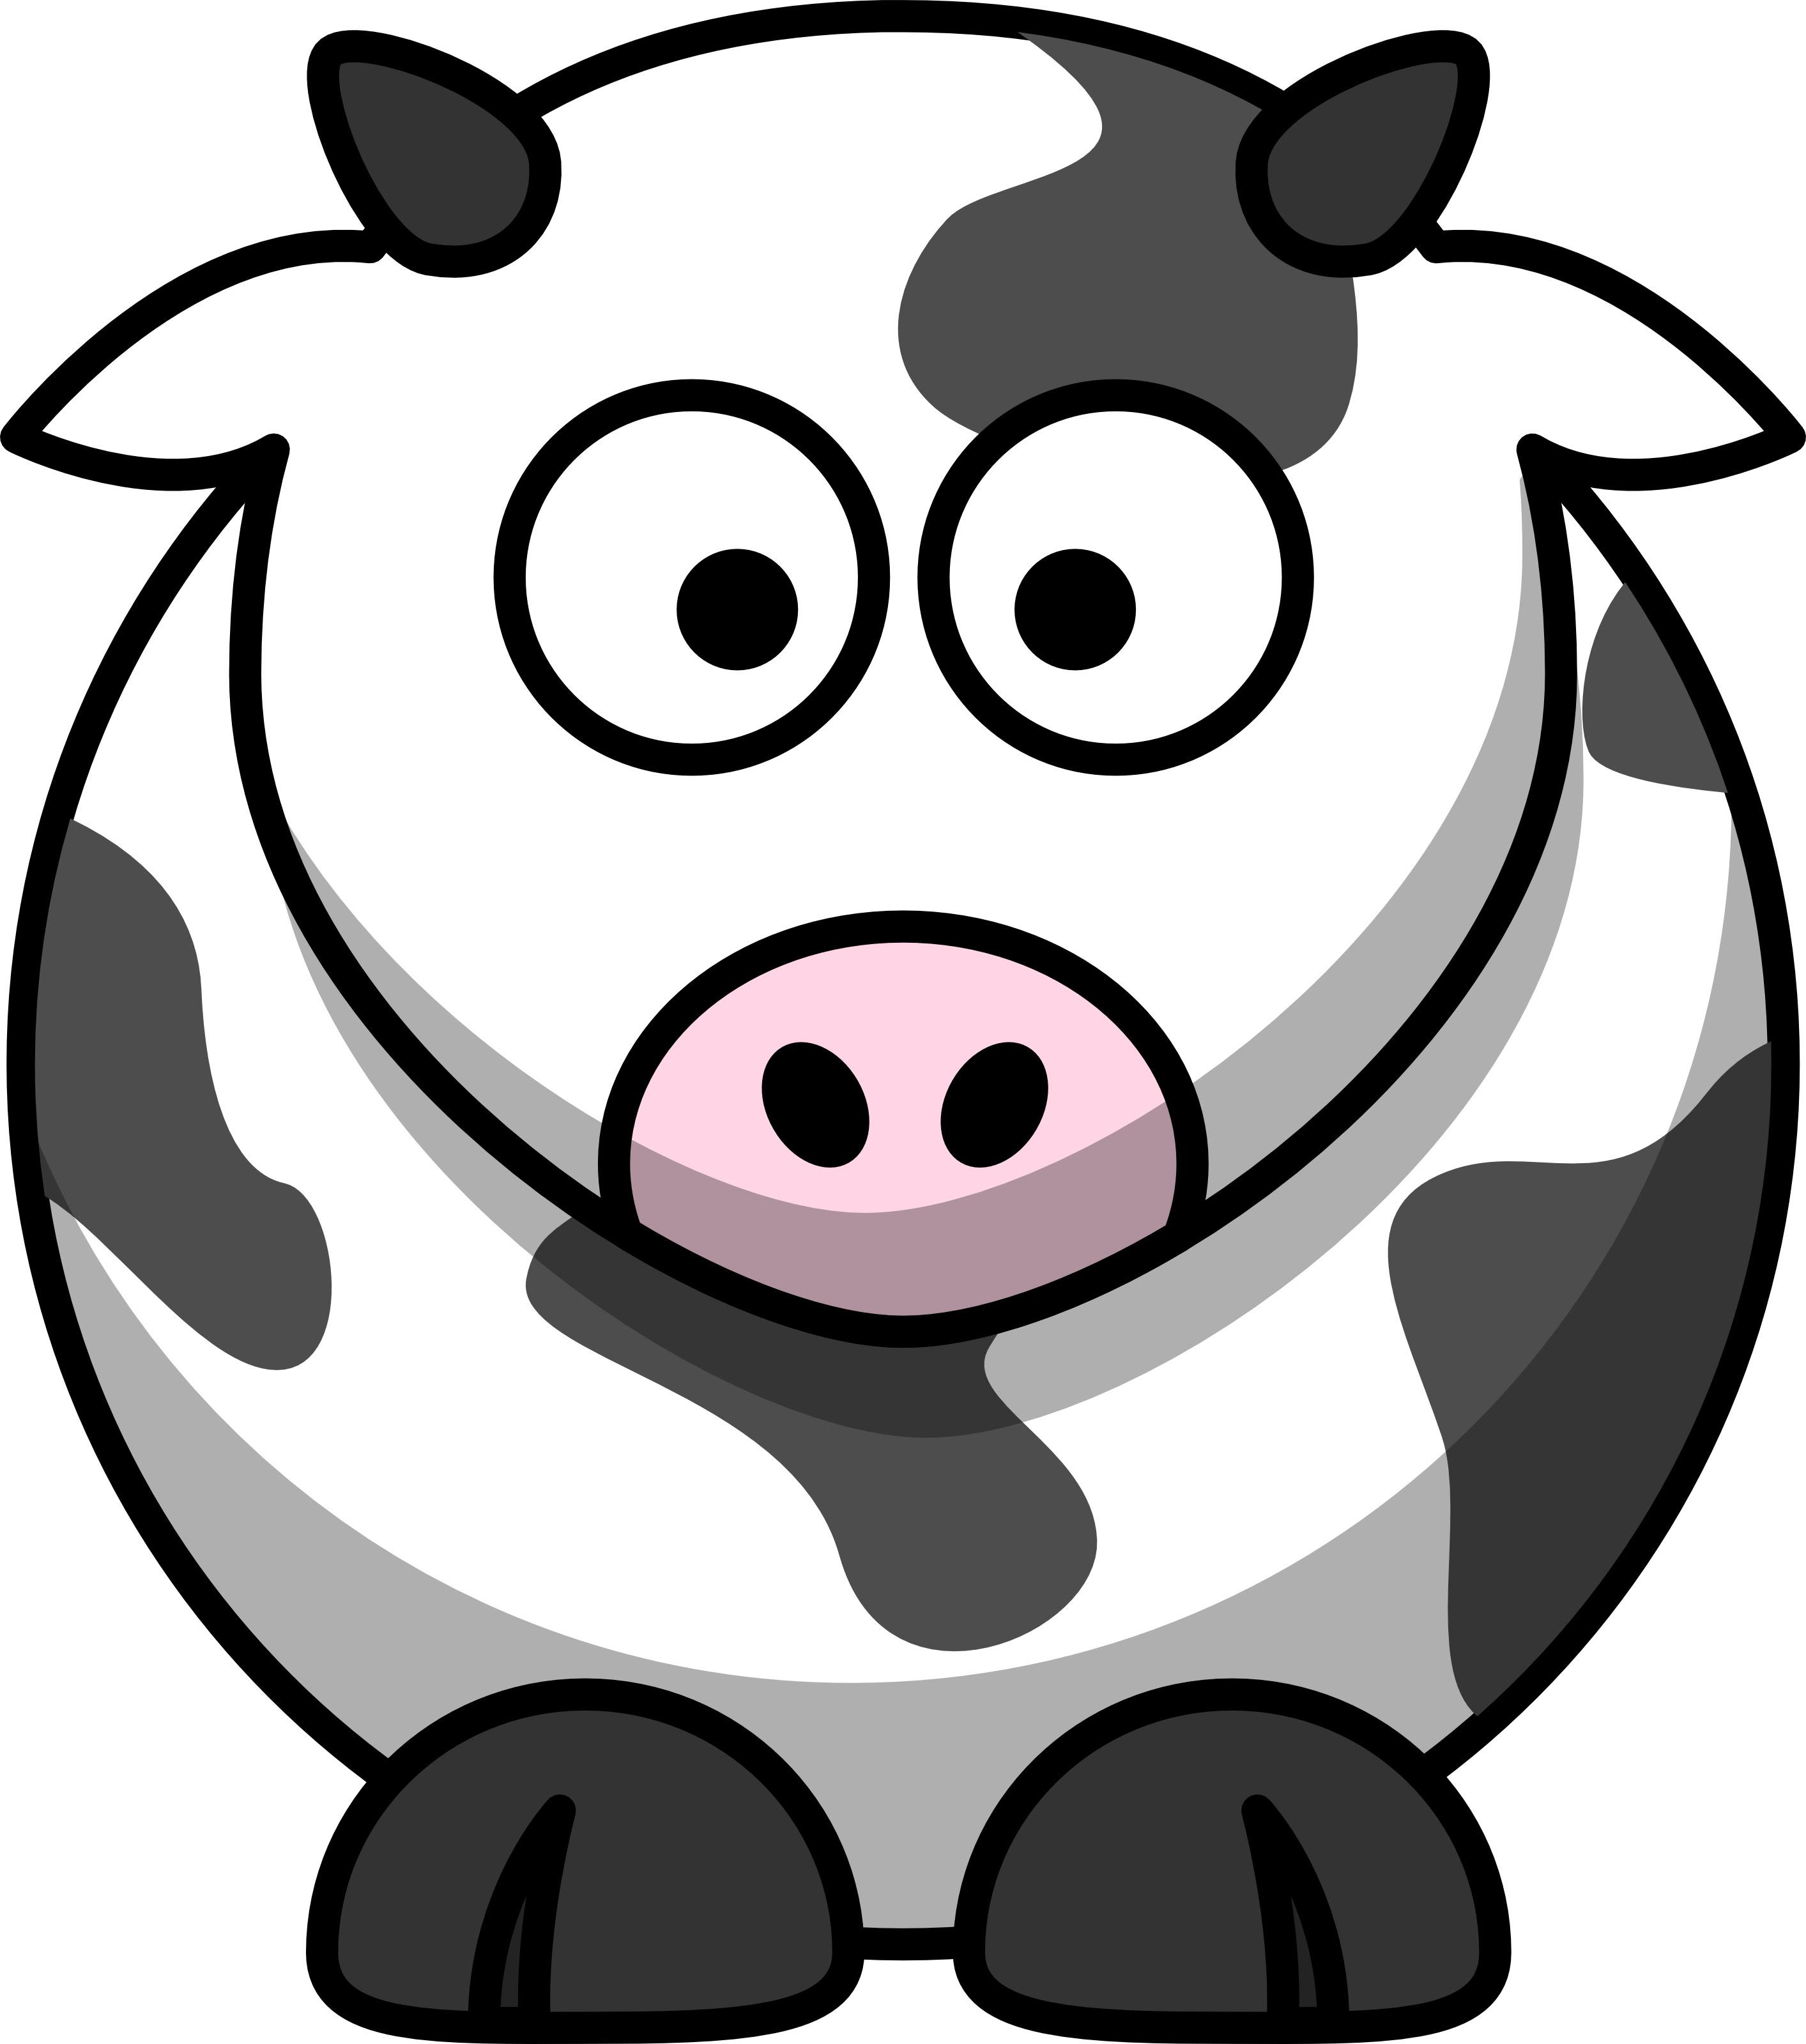 Free Cartoon Cow Clip Art   Free Images at Clker.com ...